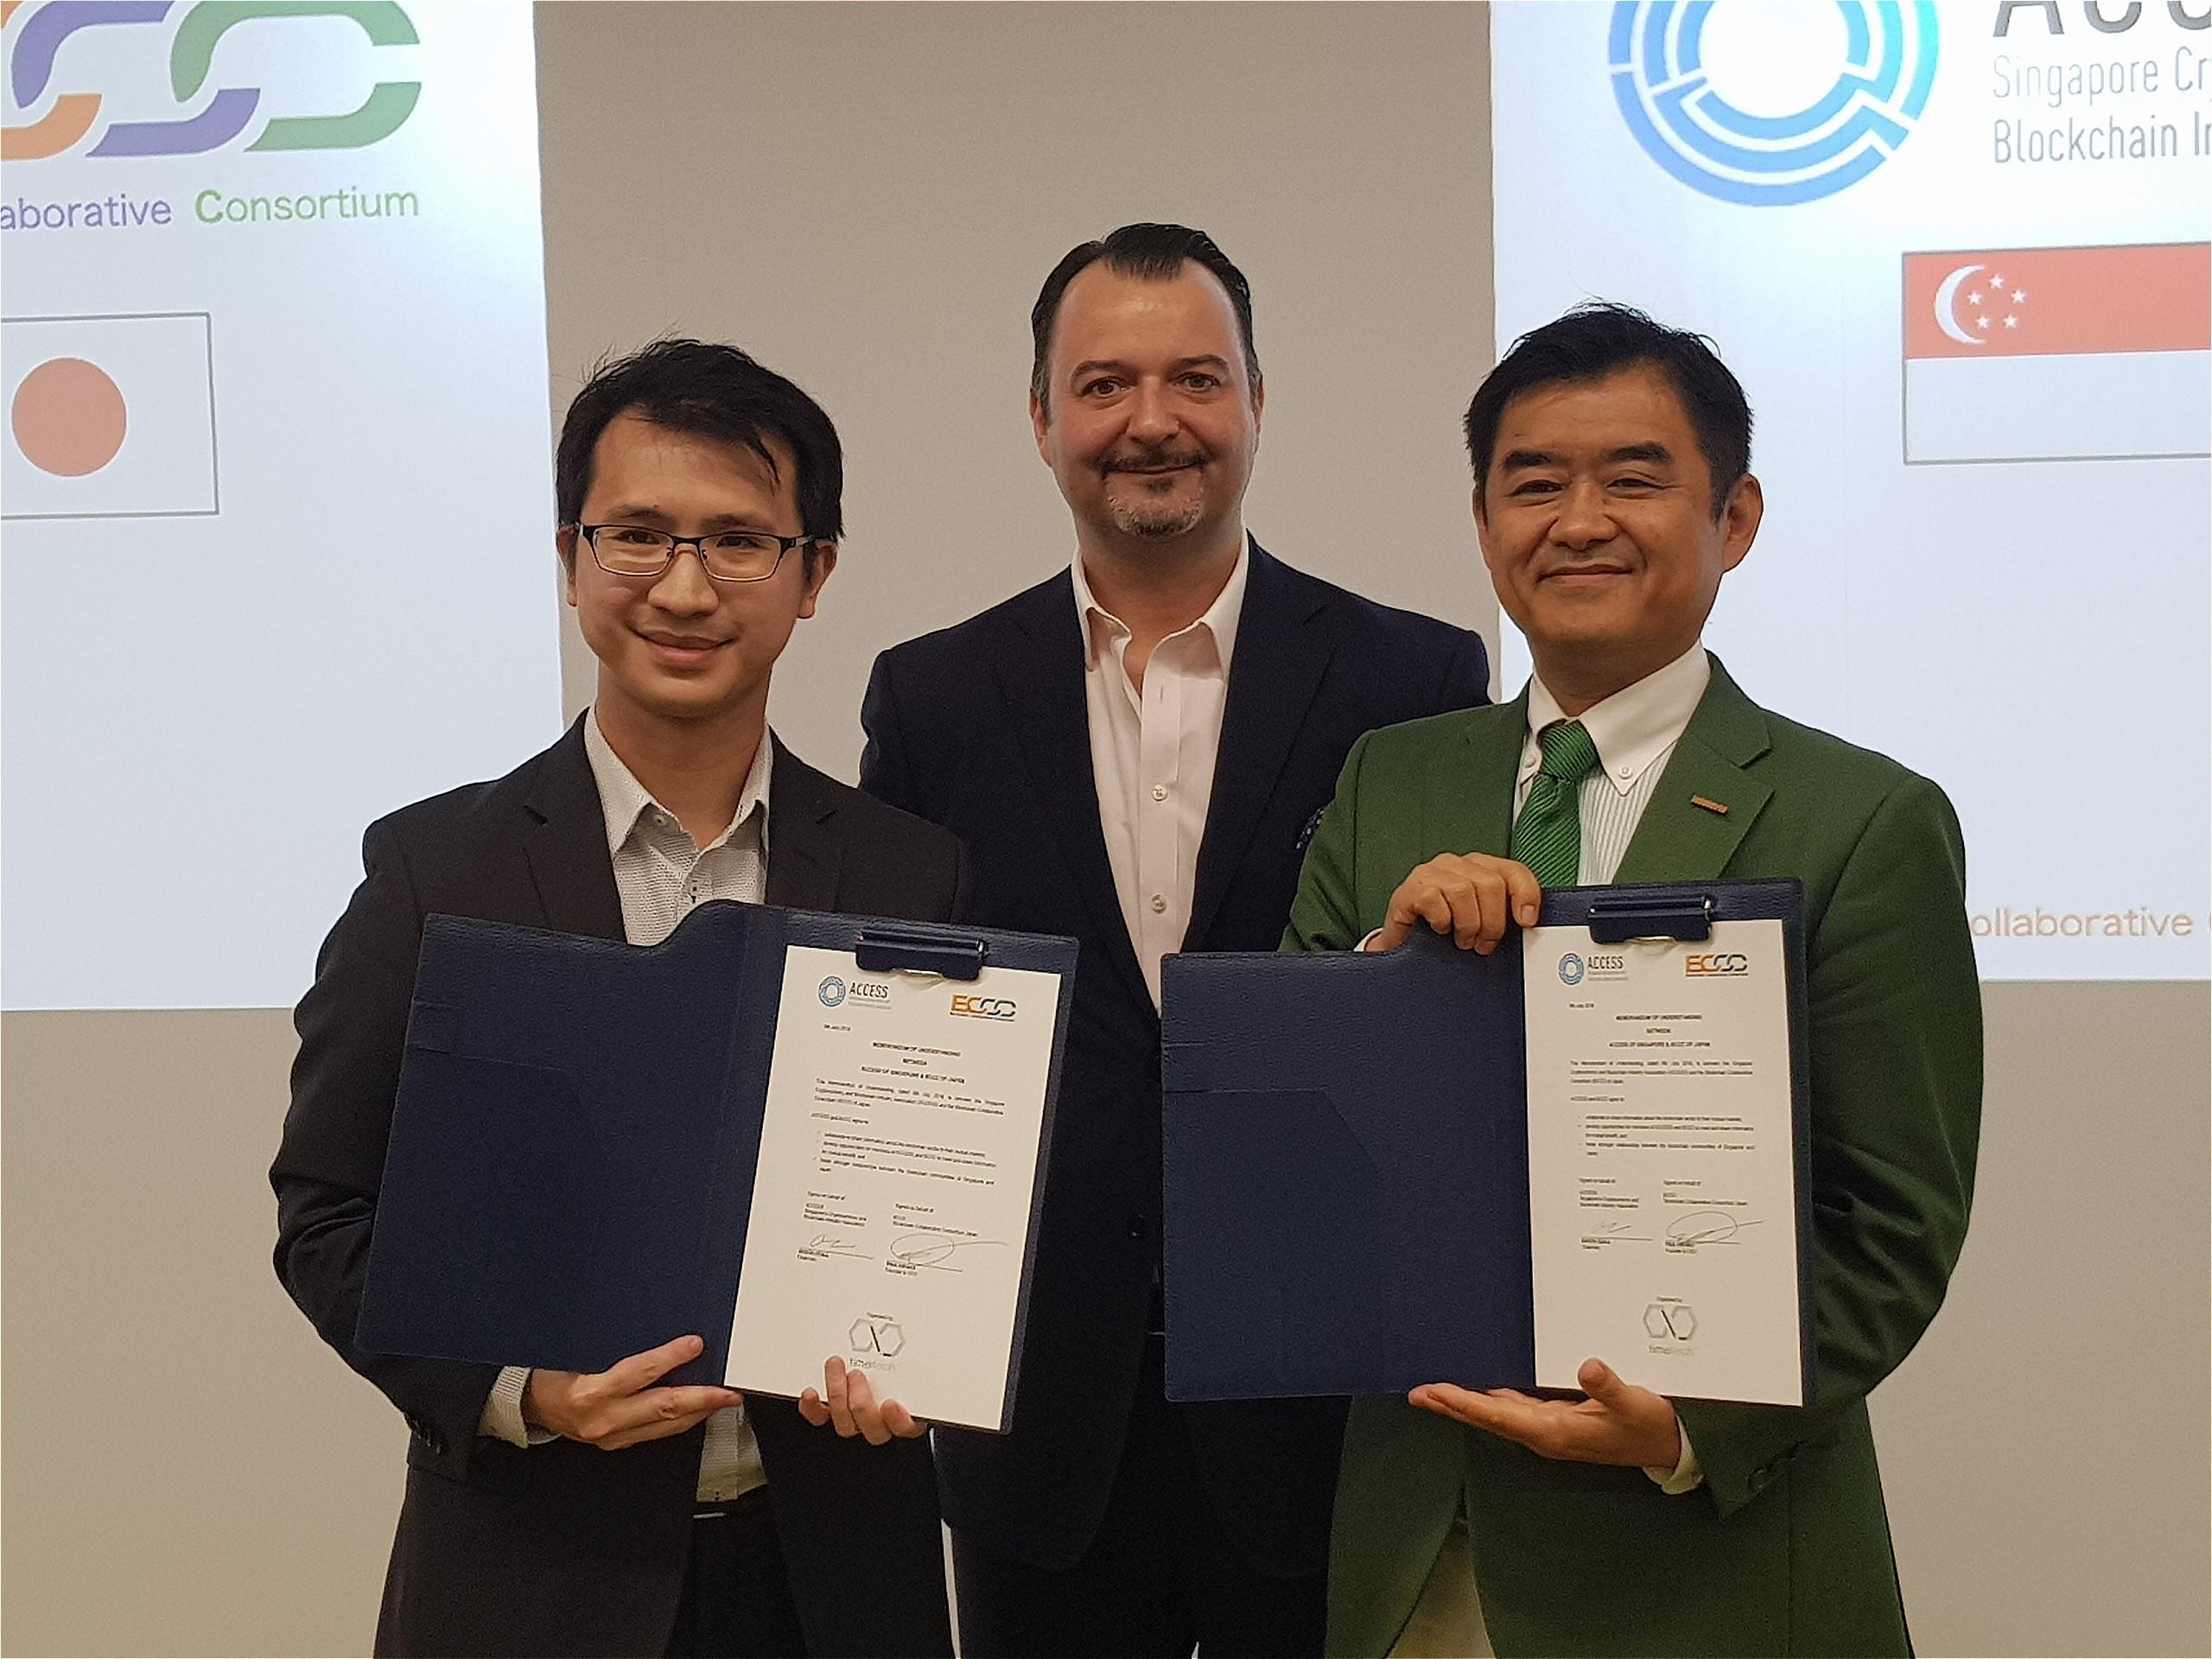 BCCCがシンガポールの仮想通貨・ブロックチェーン業界団体ACCESSと協定締結、日本にて調印式を開催